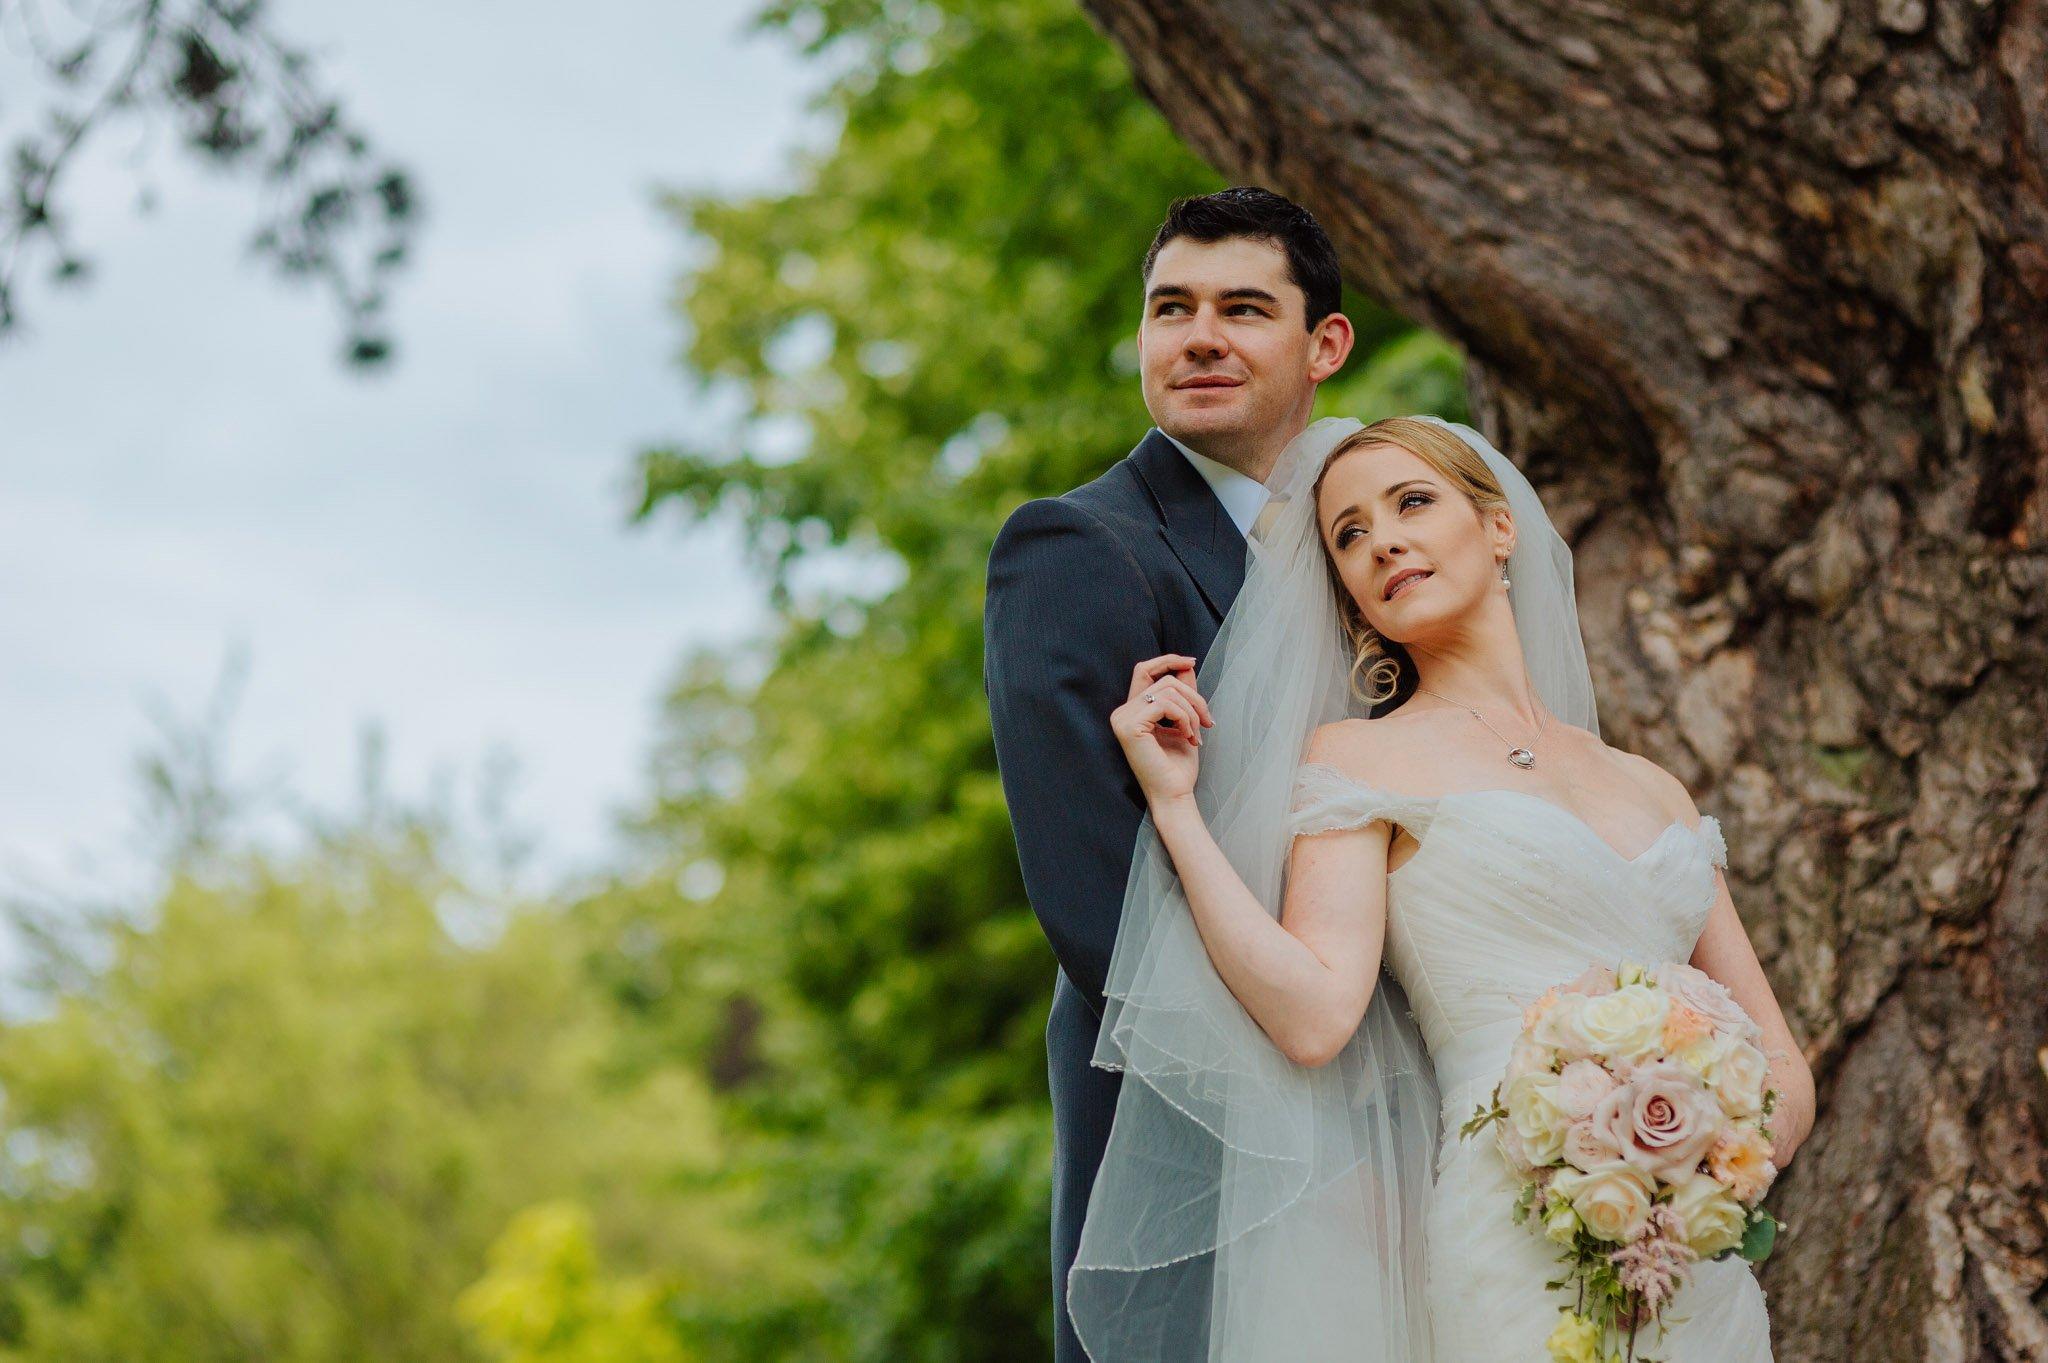 Georgina + Mike - Wedding photography in Malvern, Worcestershire 40